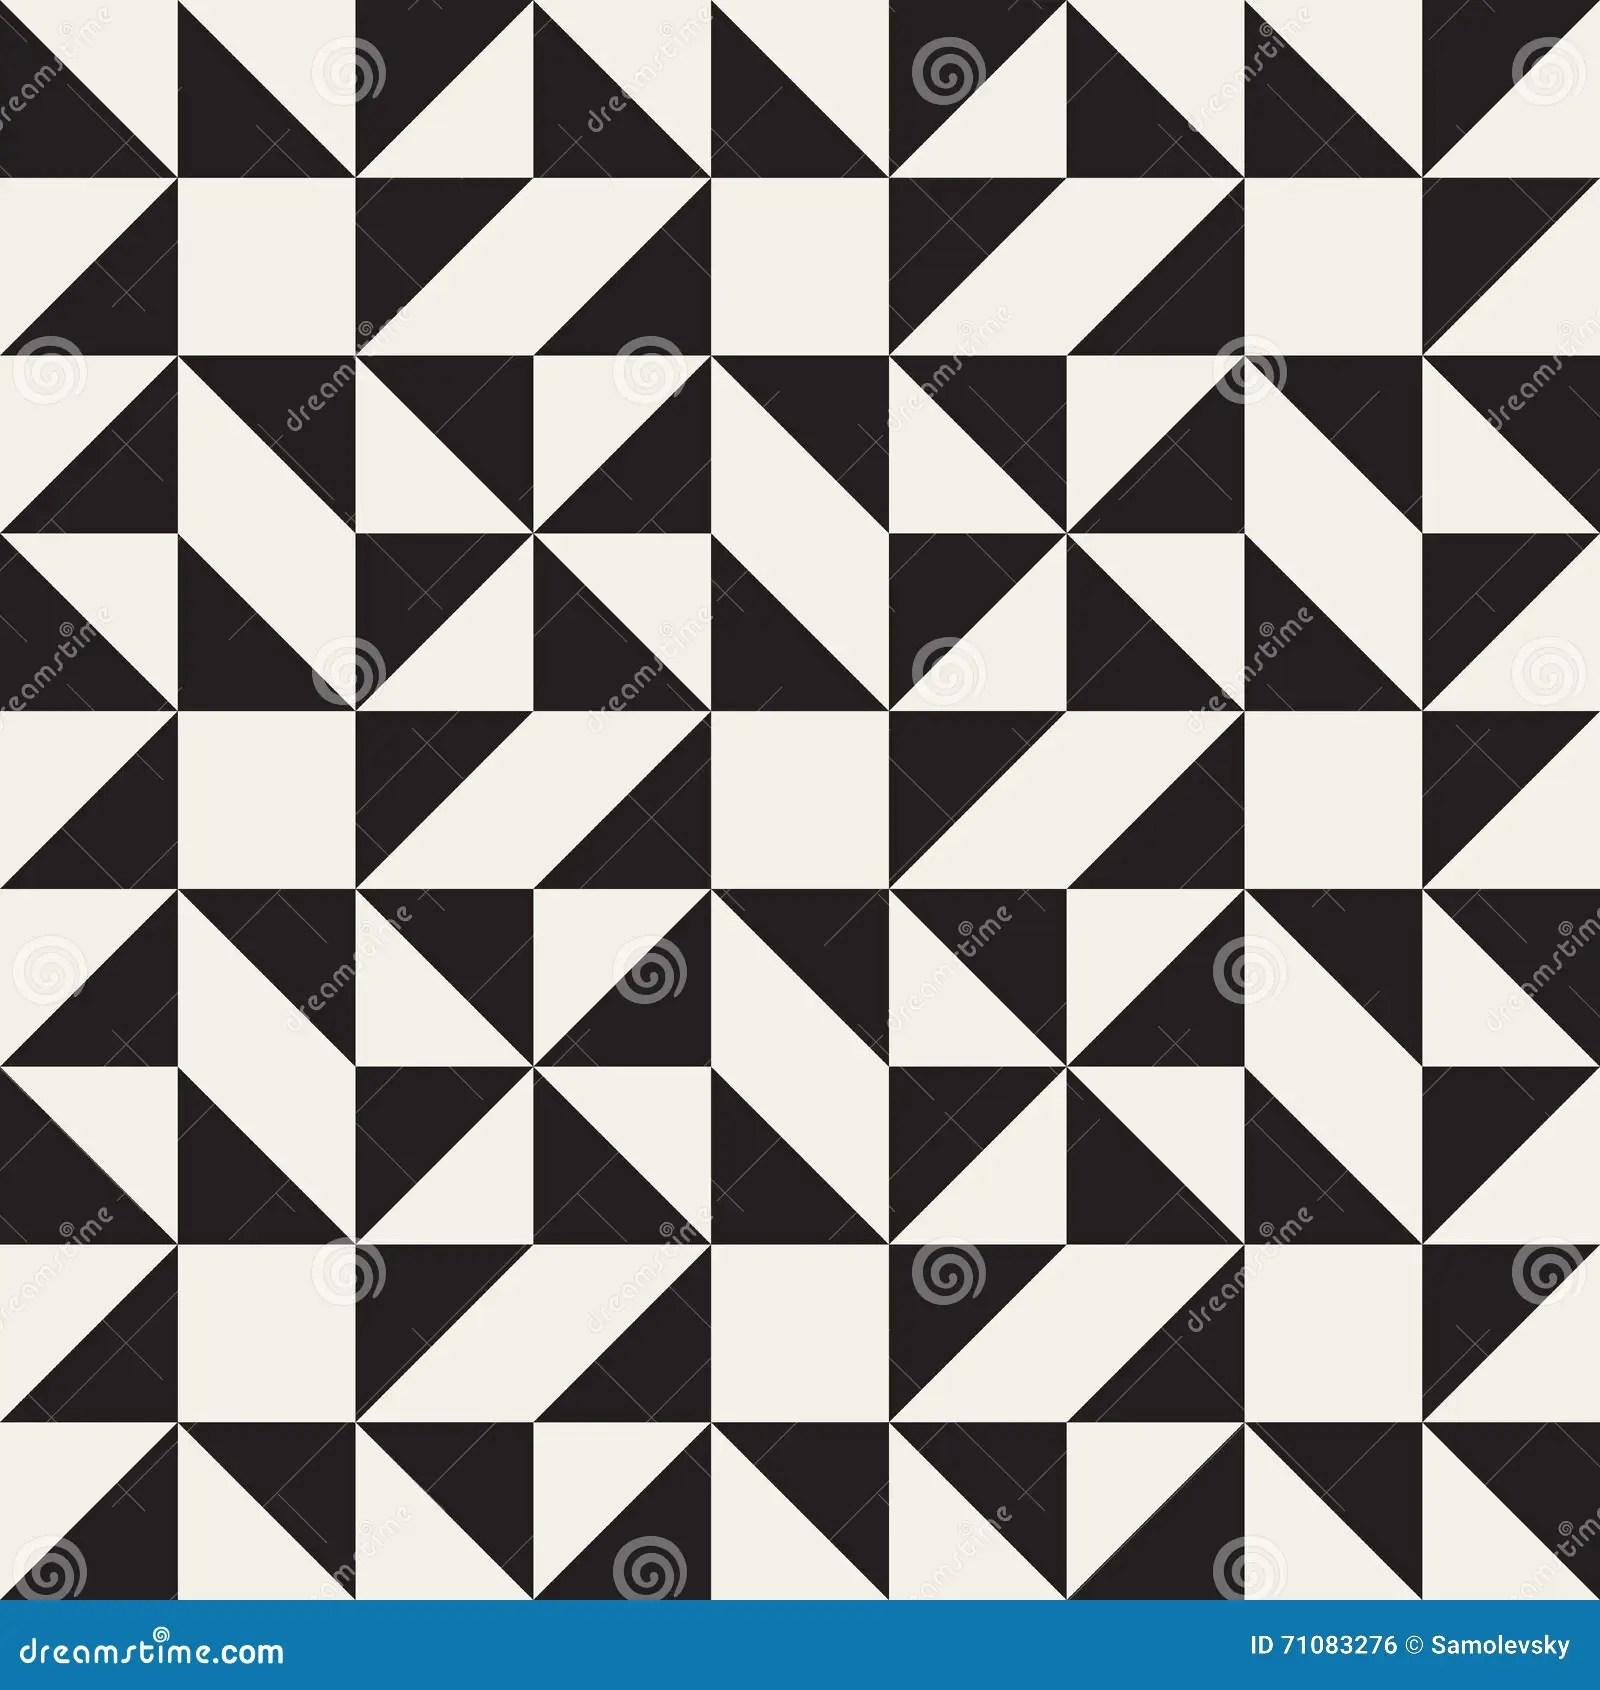 Vector Seamless Black And White Geometric Square Triangle